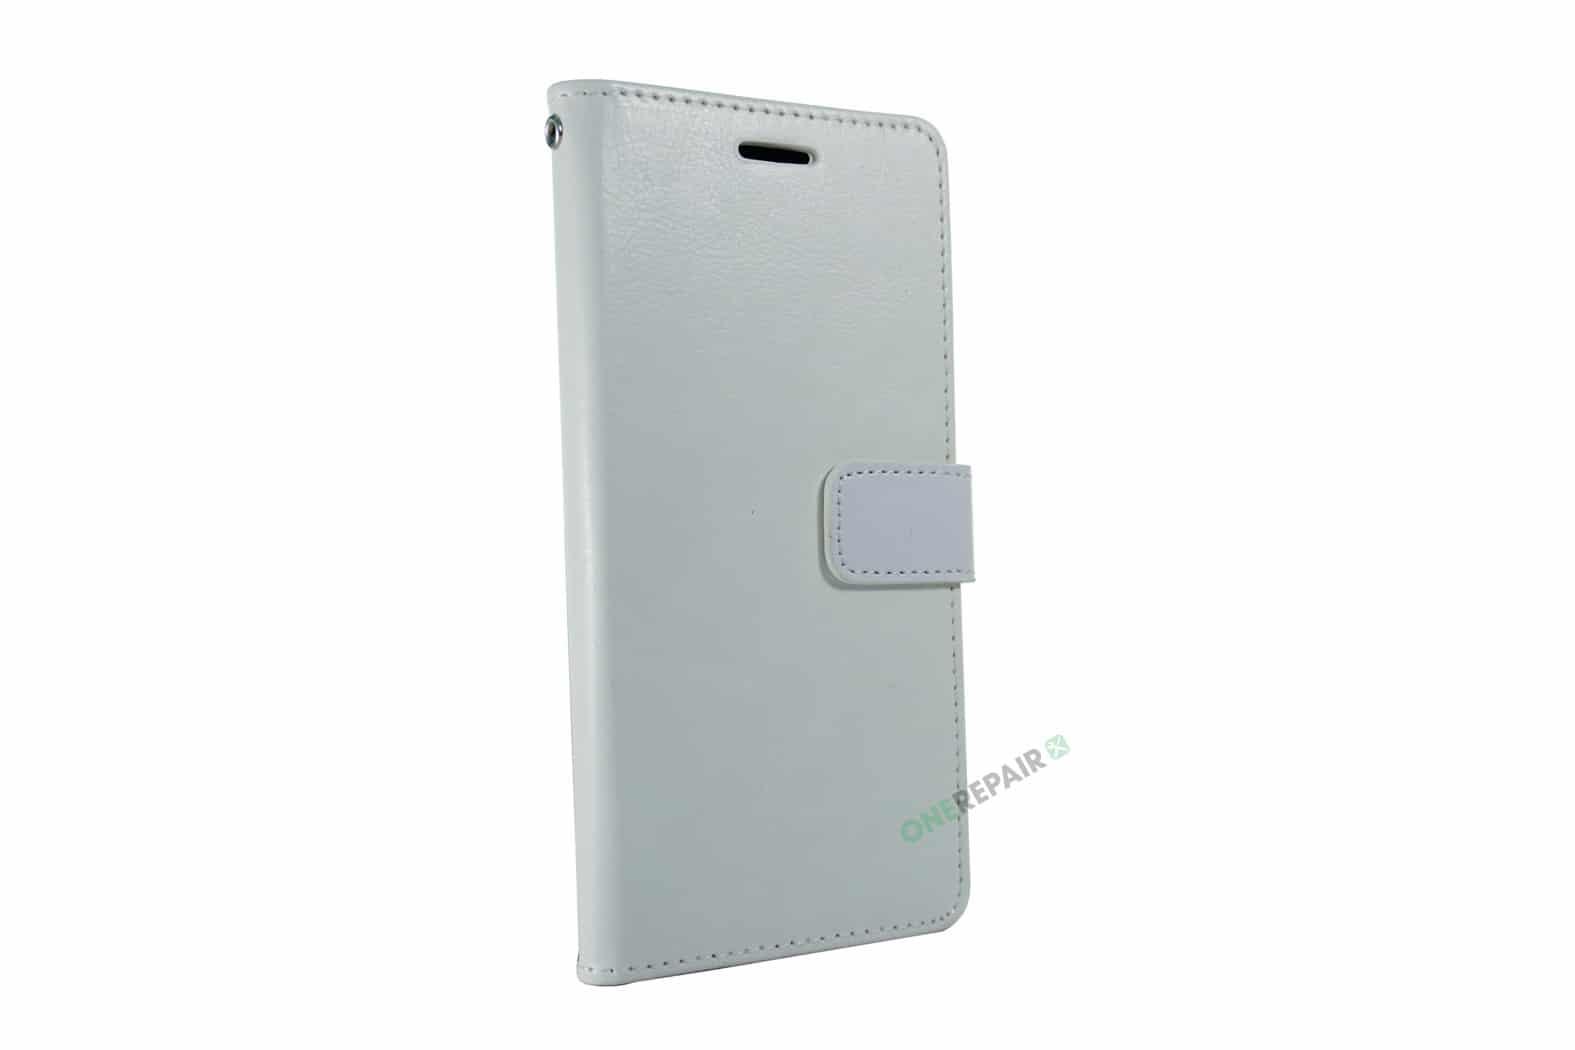 353598-002_Samsung_A20e_Flipcover_Classic_Hvid_Plads_til_kort_OneRepair_00002